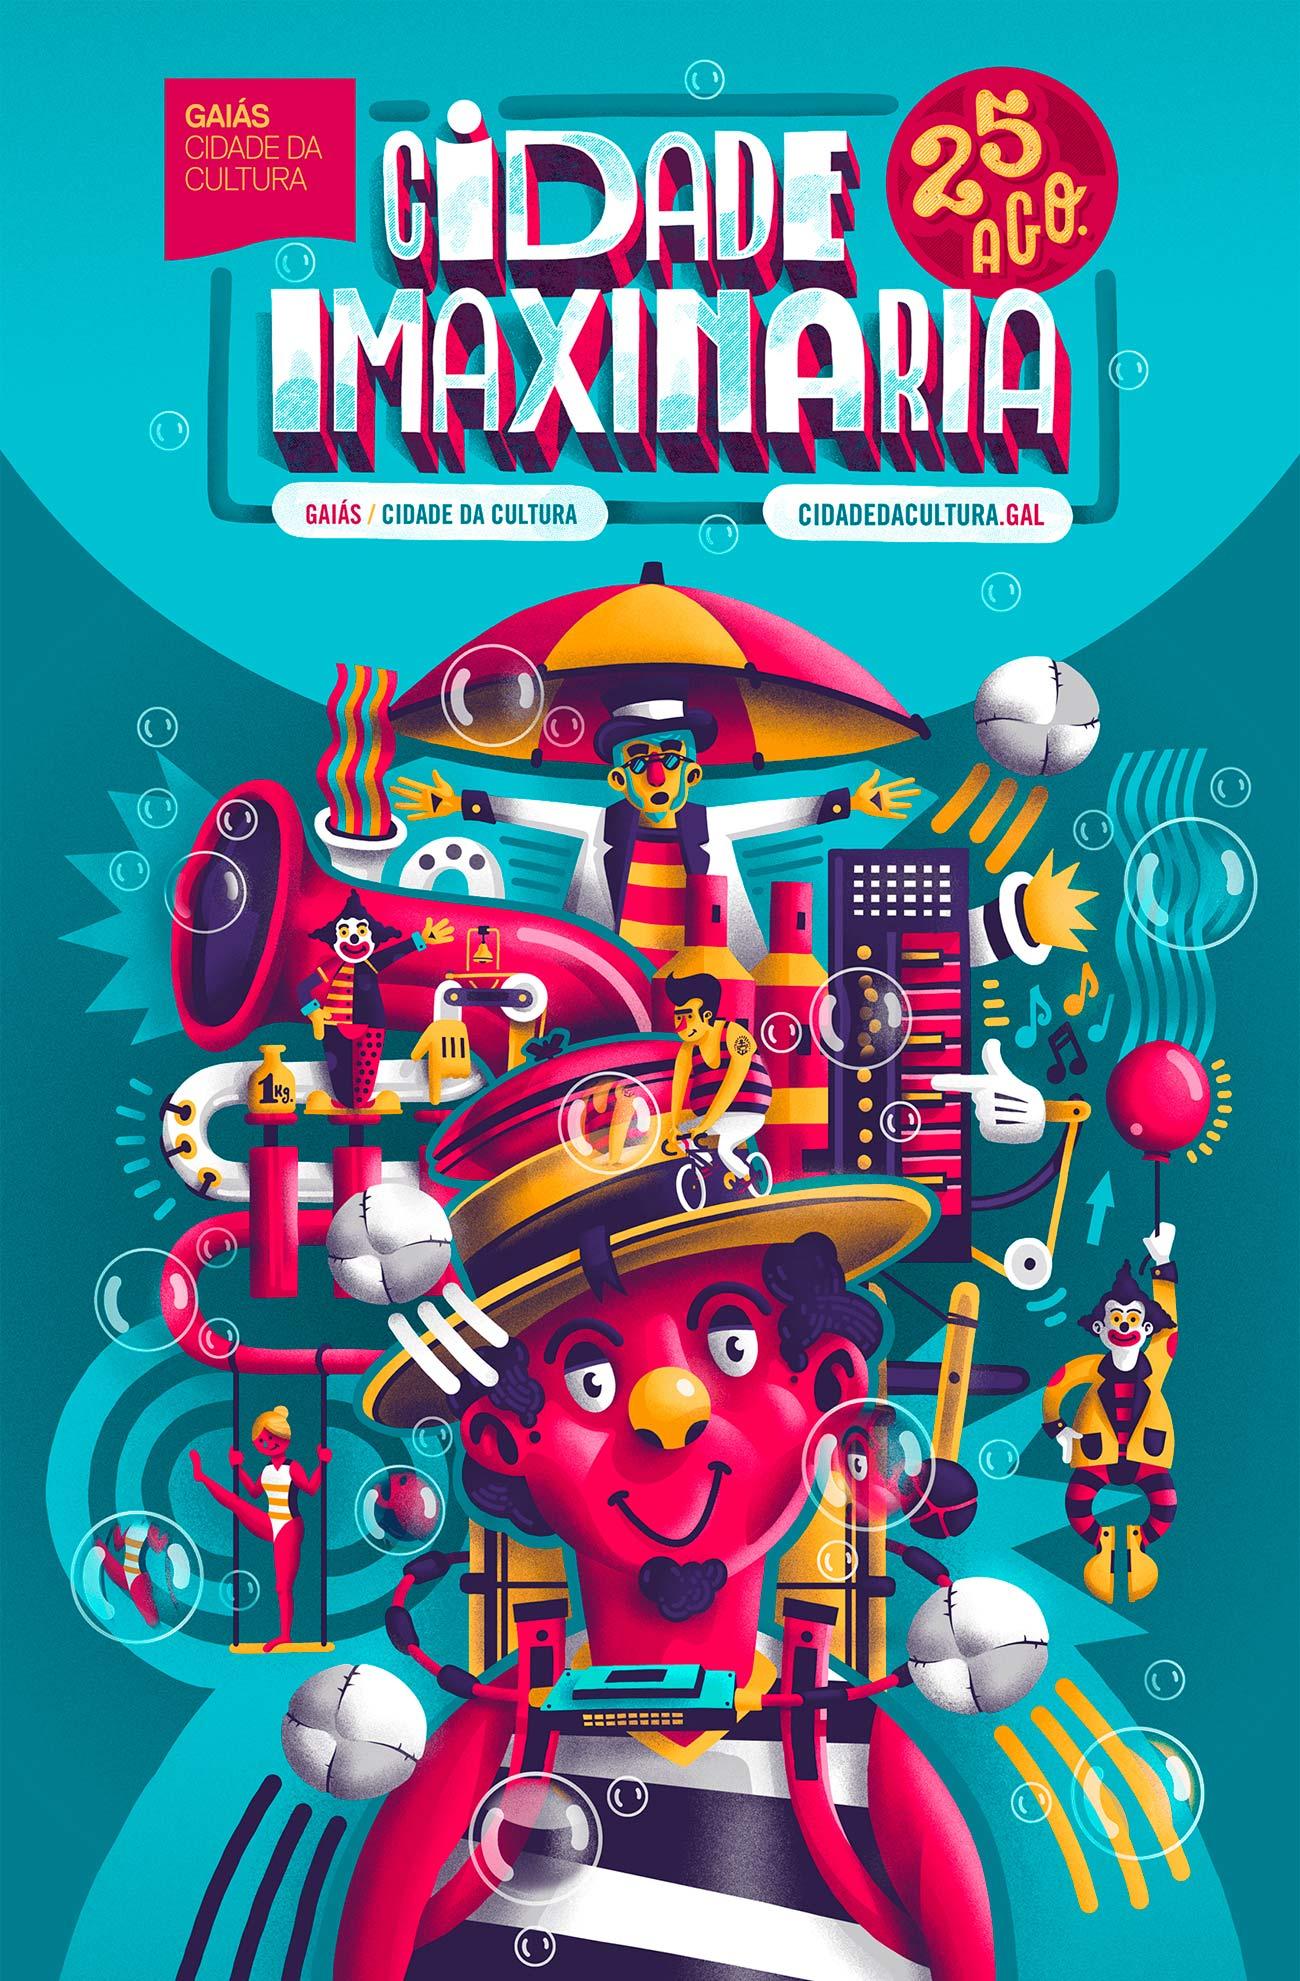 Illustration for Cidade Imaxianria 2018 by Sr.Reny